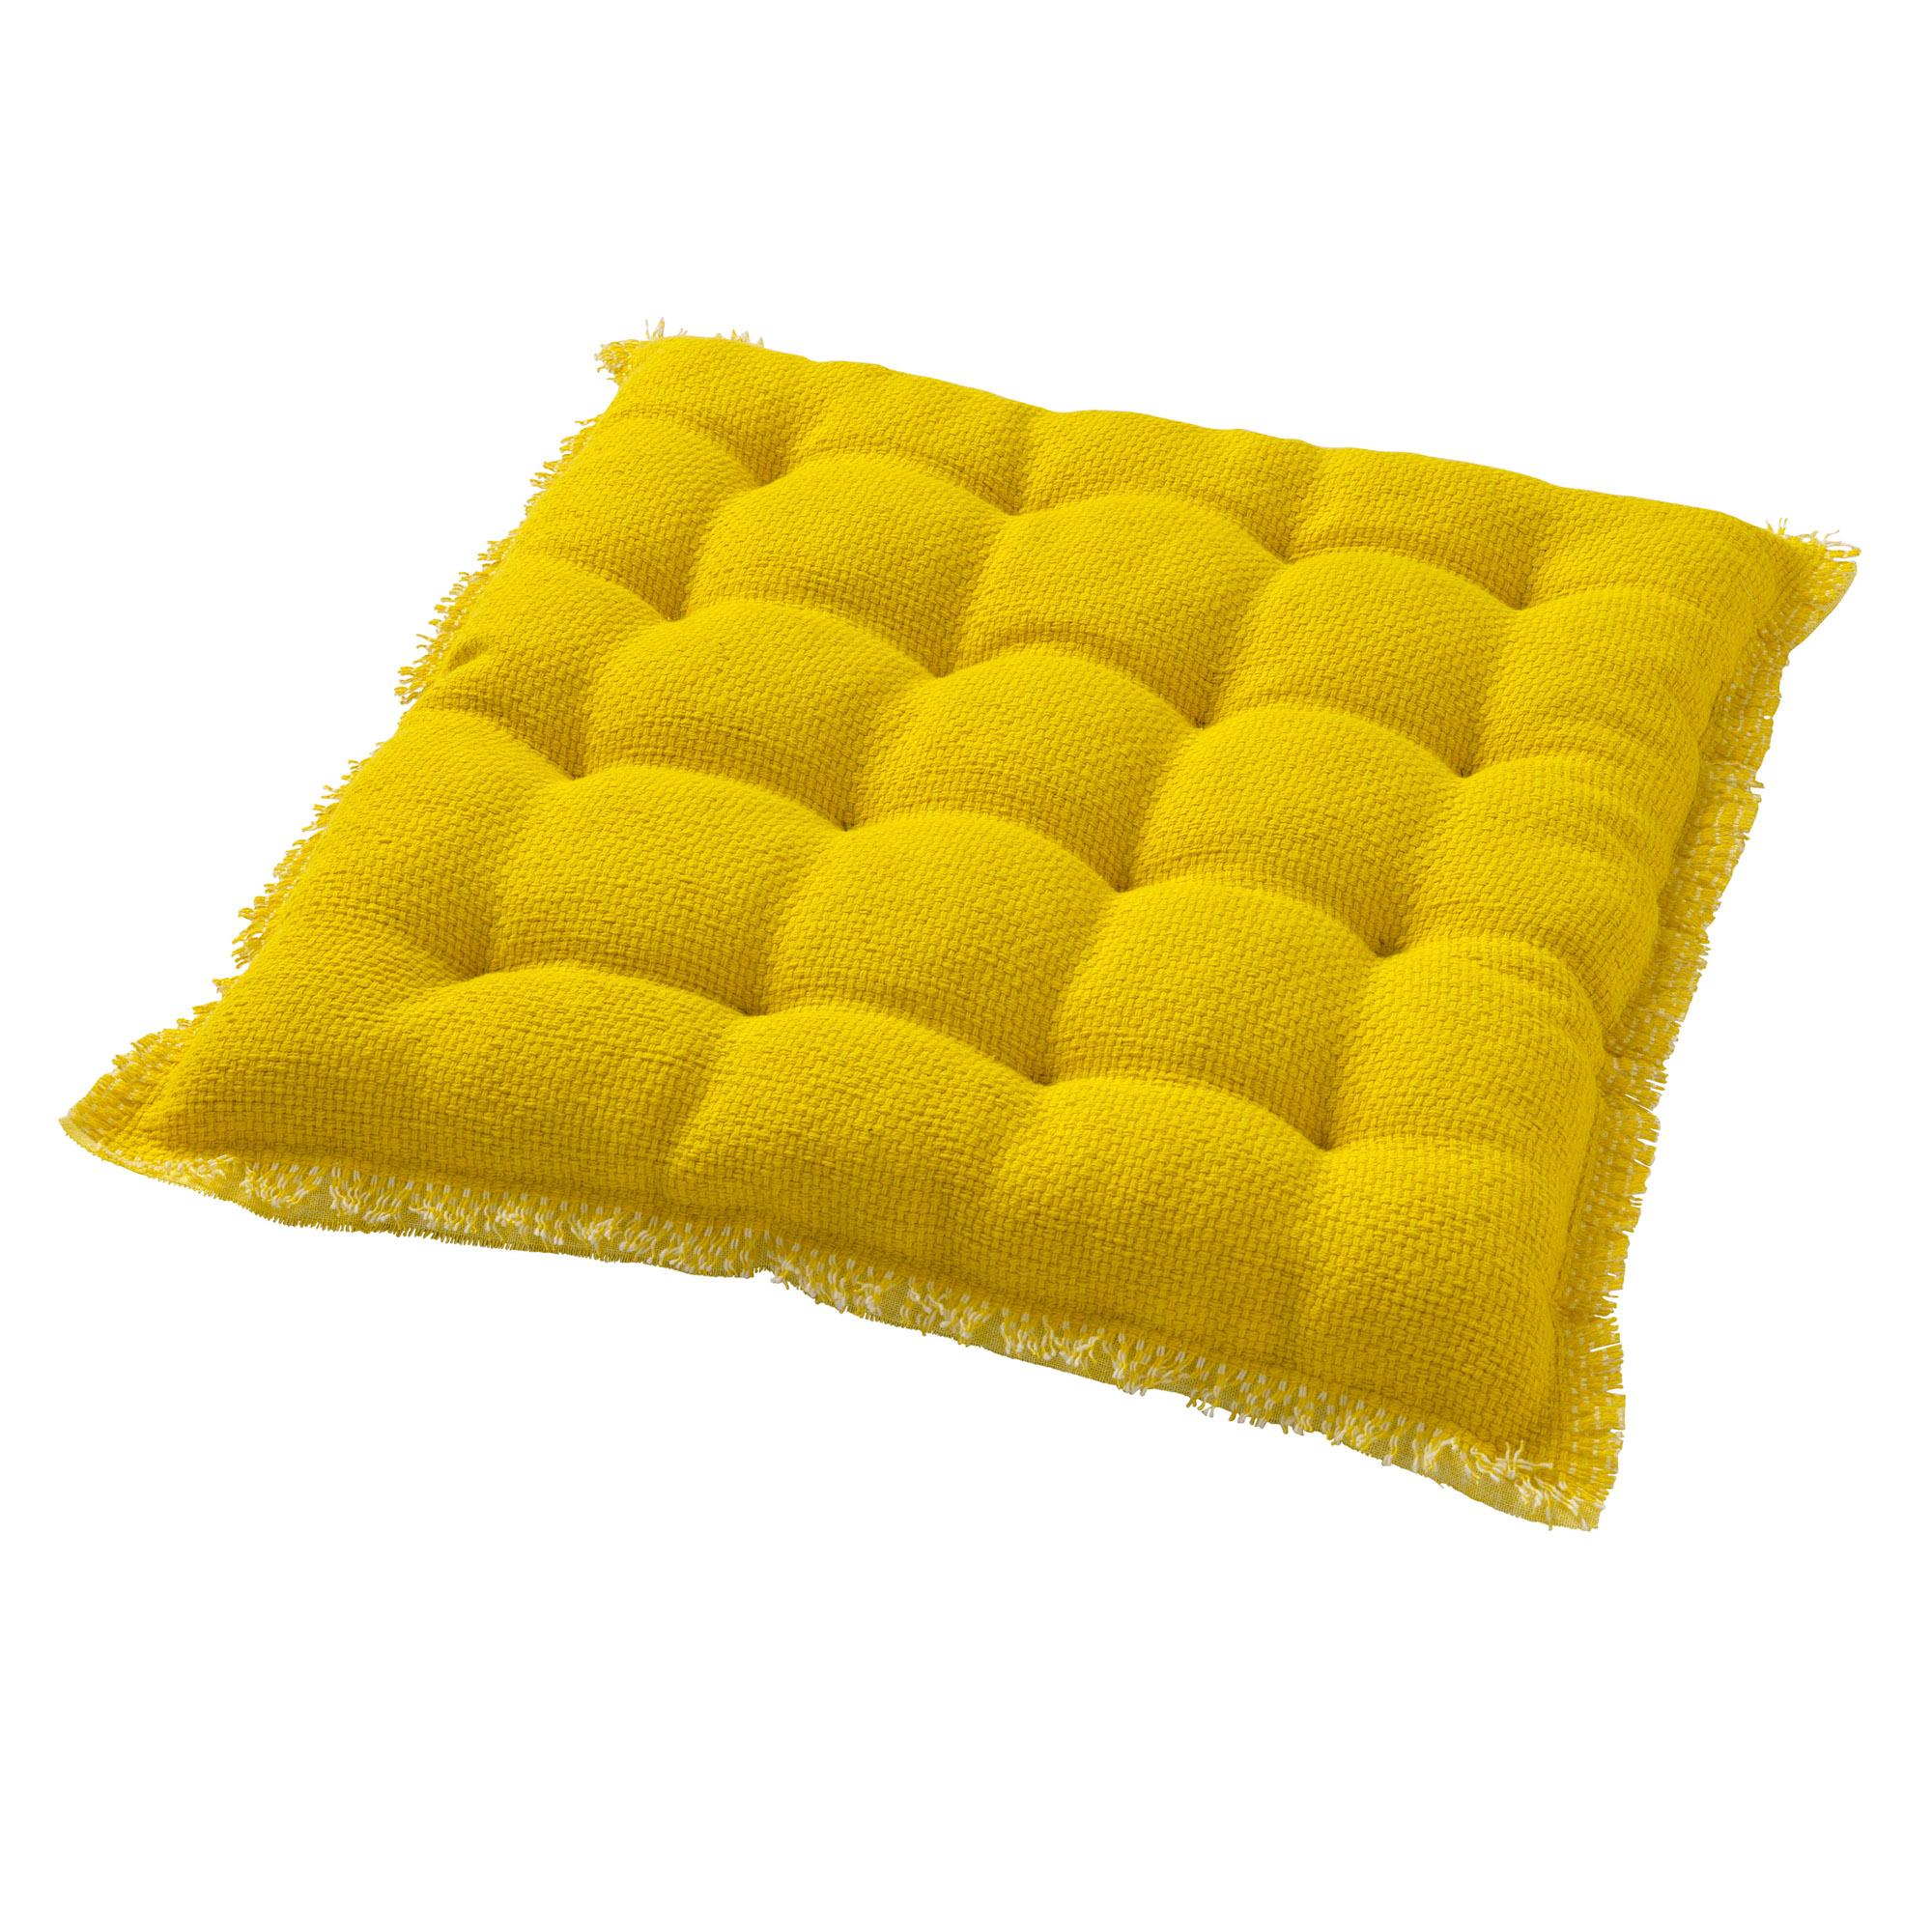 BURTO - Stoelkussen van katoen Lemon 40x40 cm